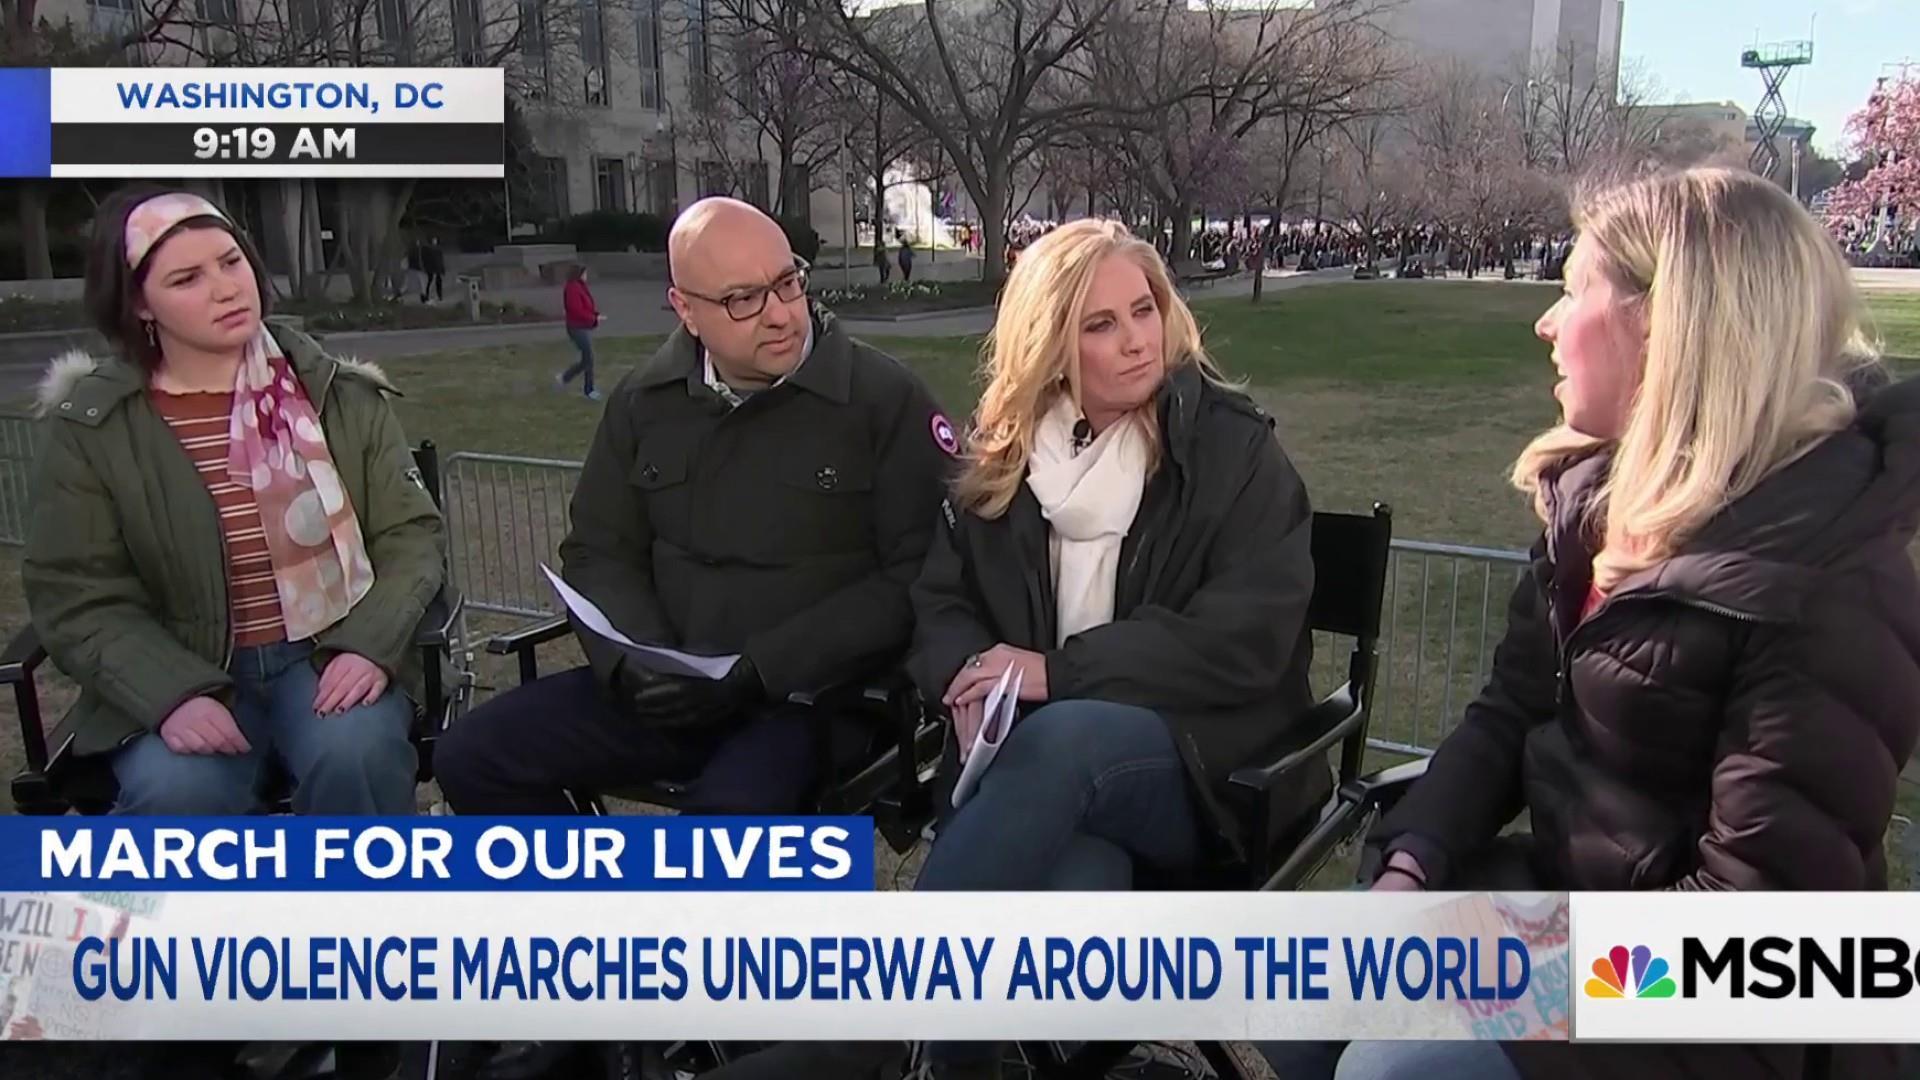 Columbine survivor: 'We were told this would never happen again'